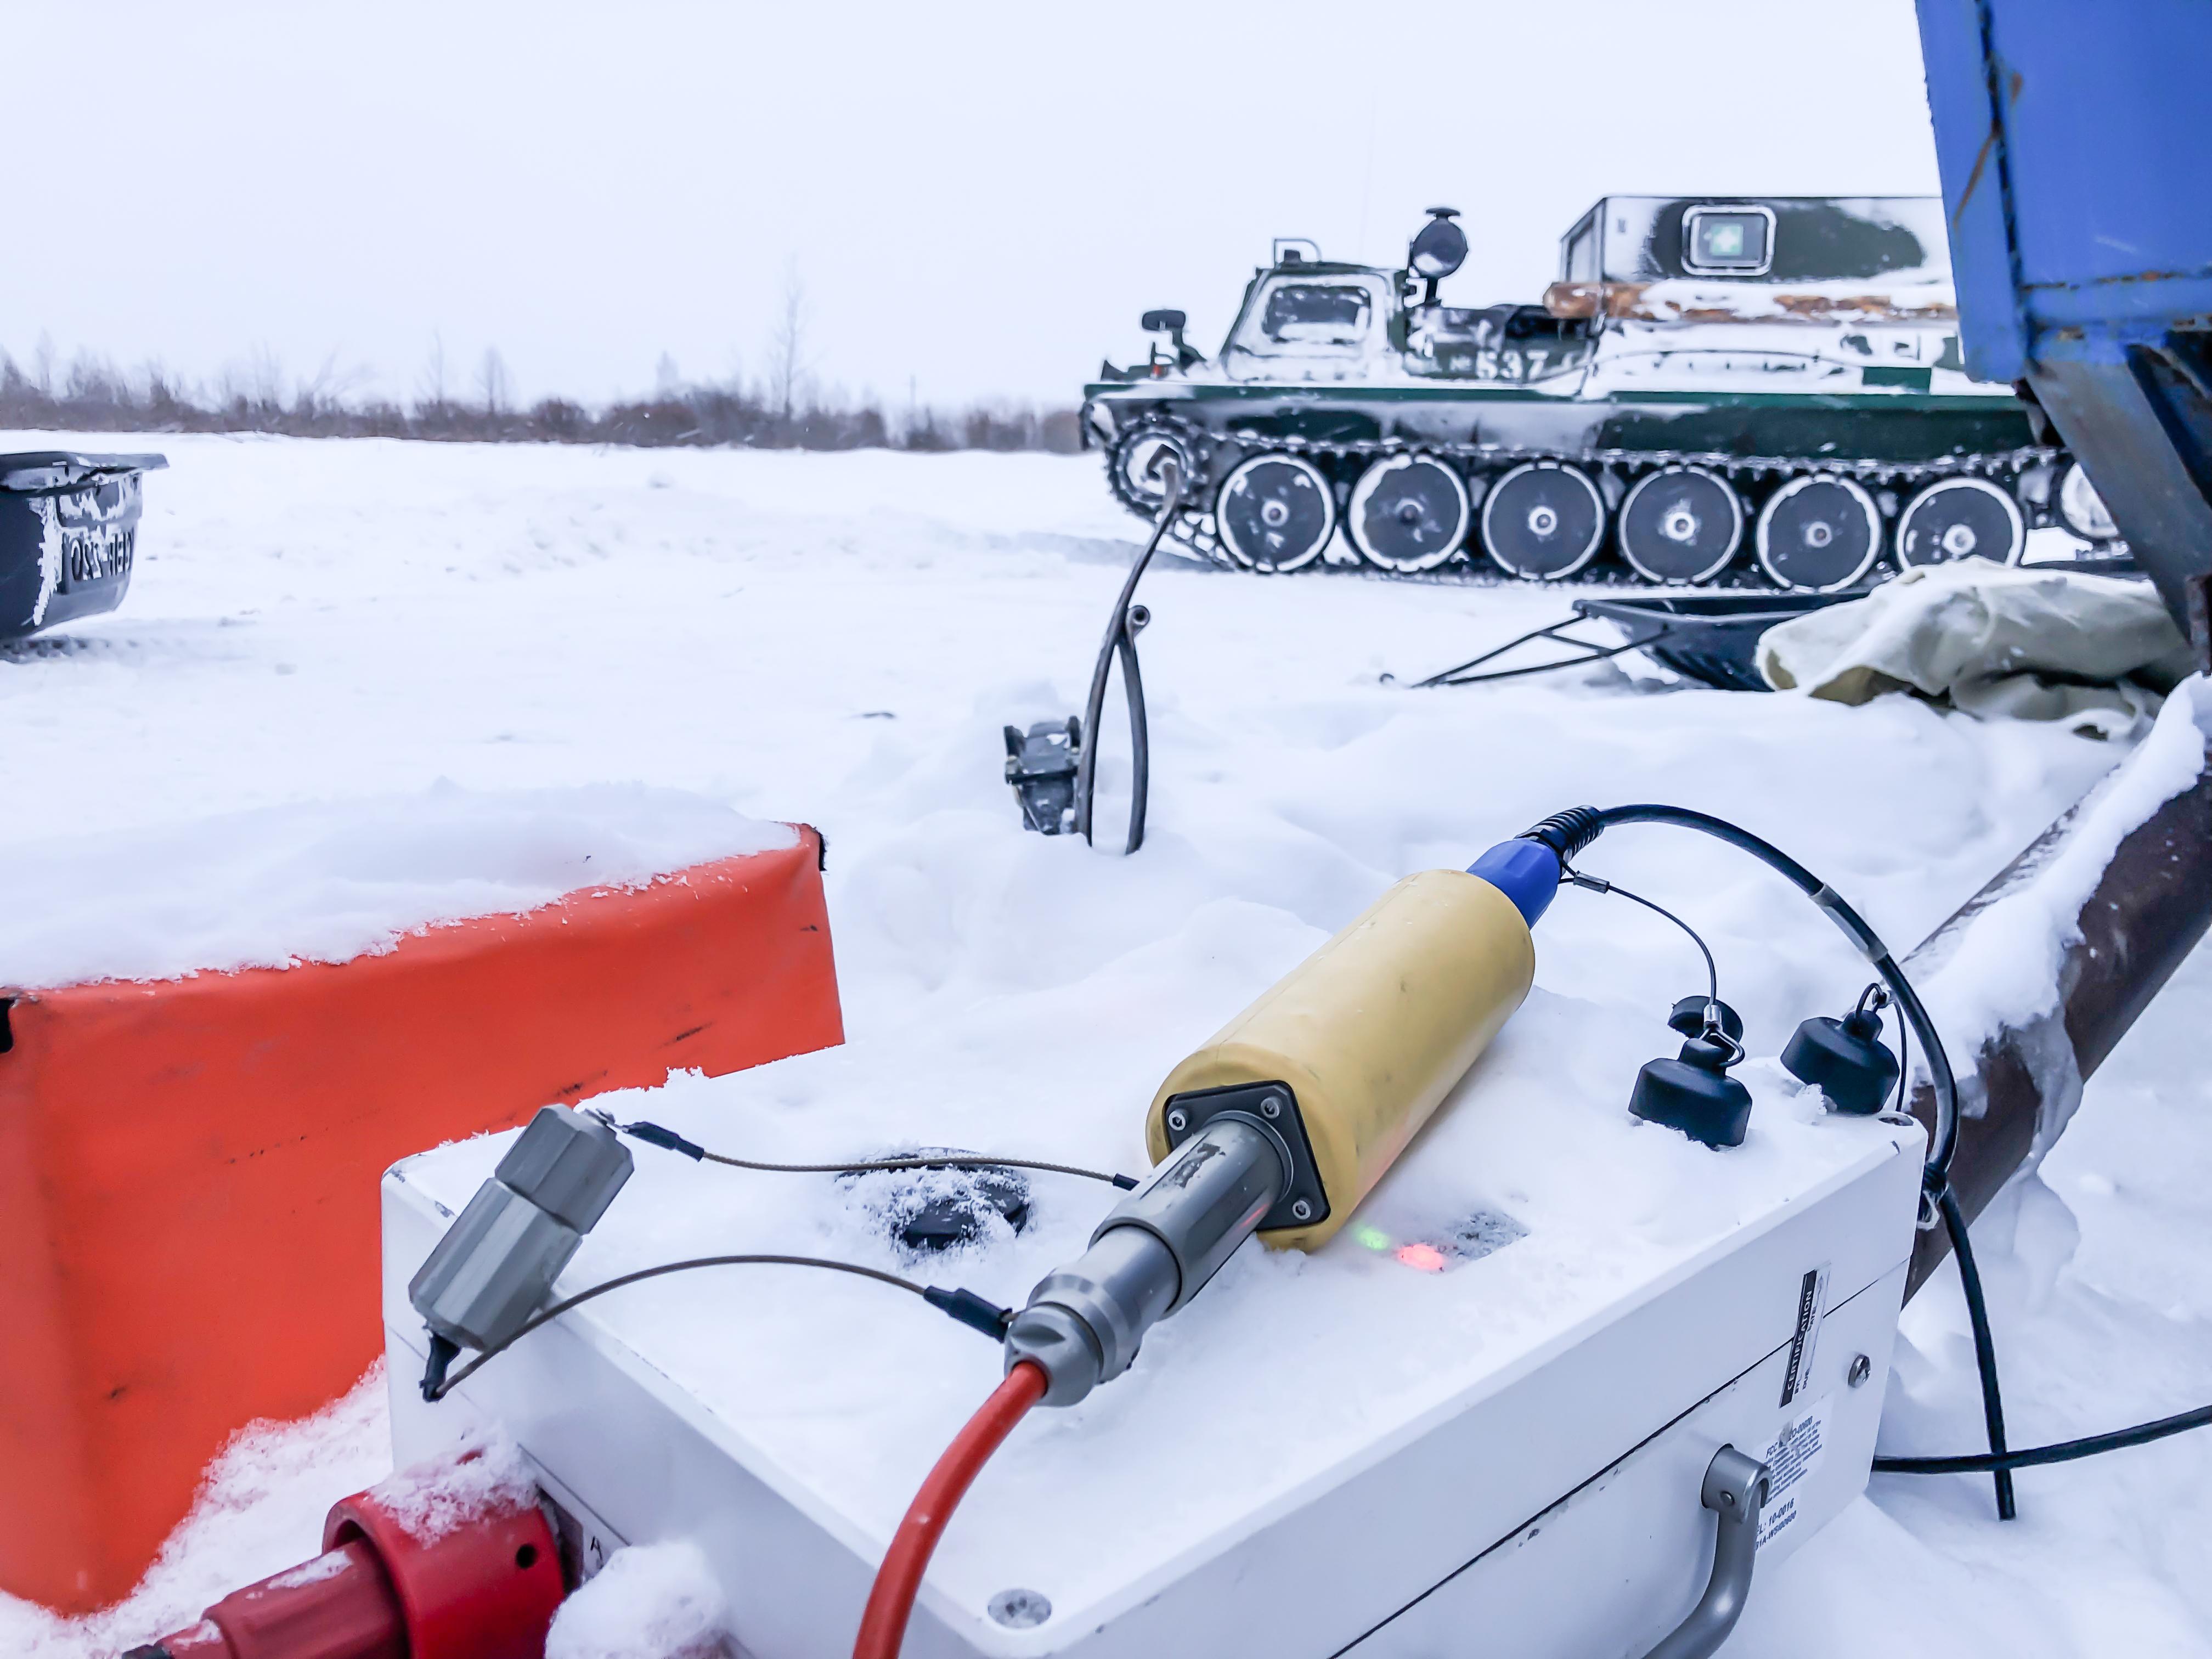 Amphenol FSI Fiber Optic Network Deployed For Geophysical Exploration